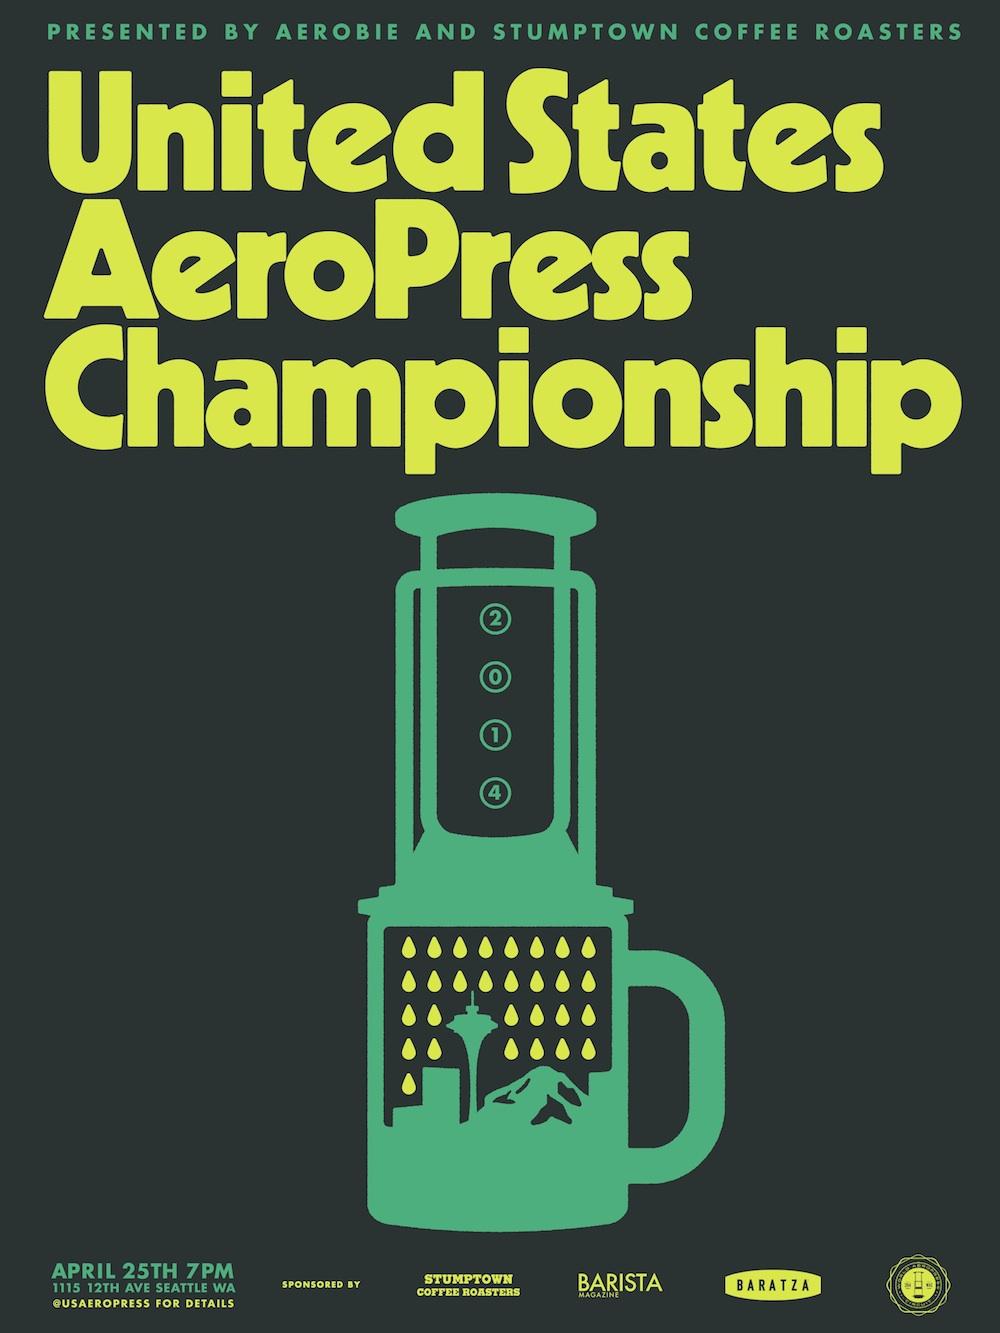 United States Aeropress Championship 2014